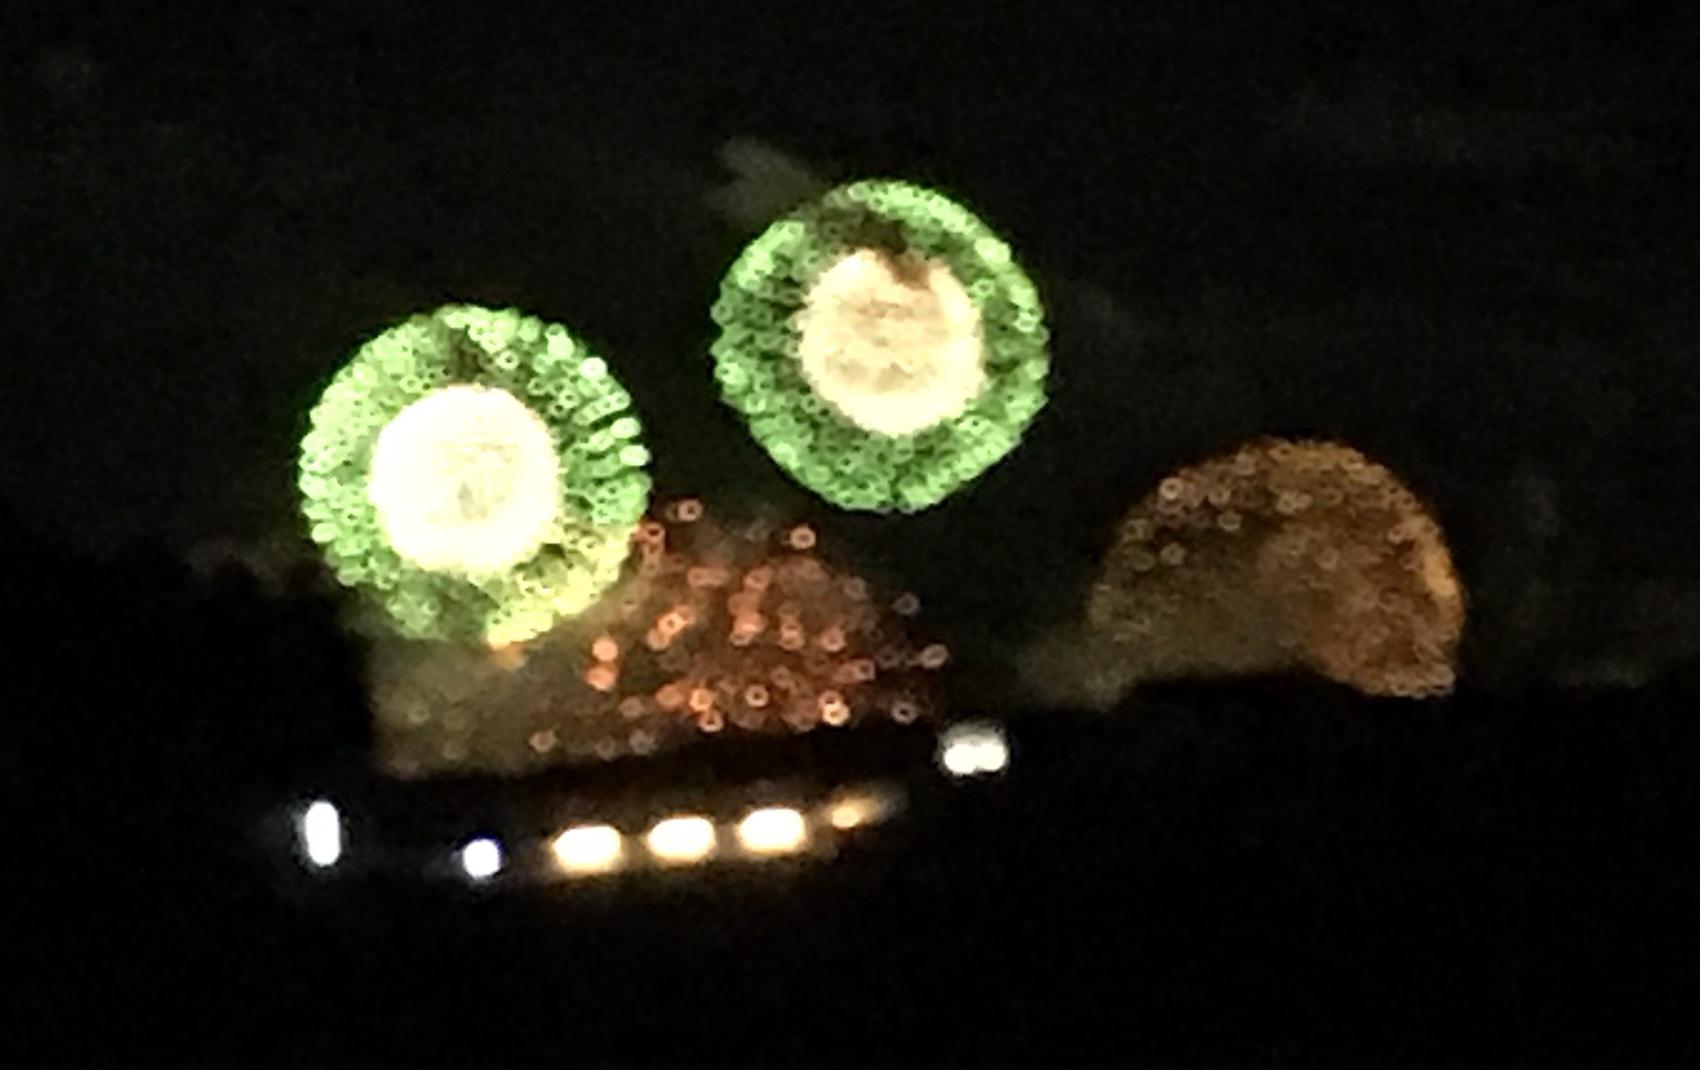 琵琶湖の花火_b0236472_22301697.jpeg